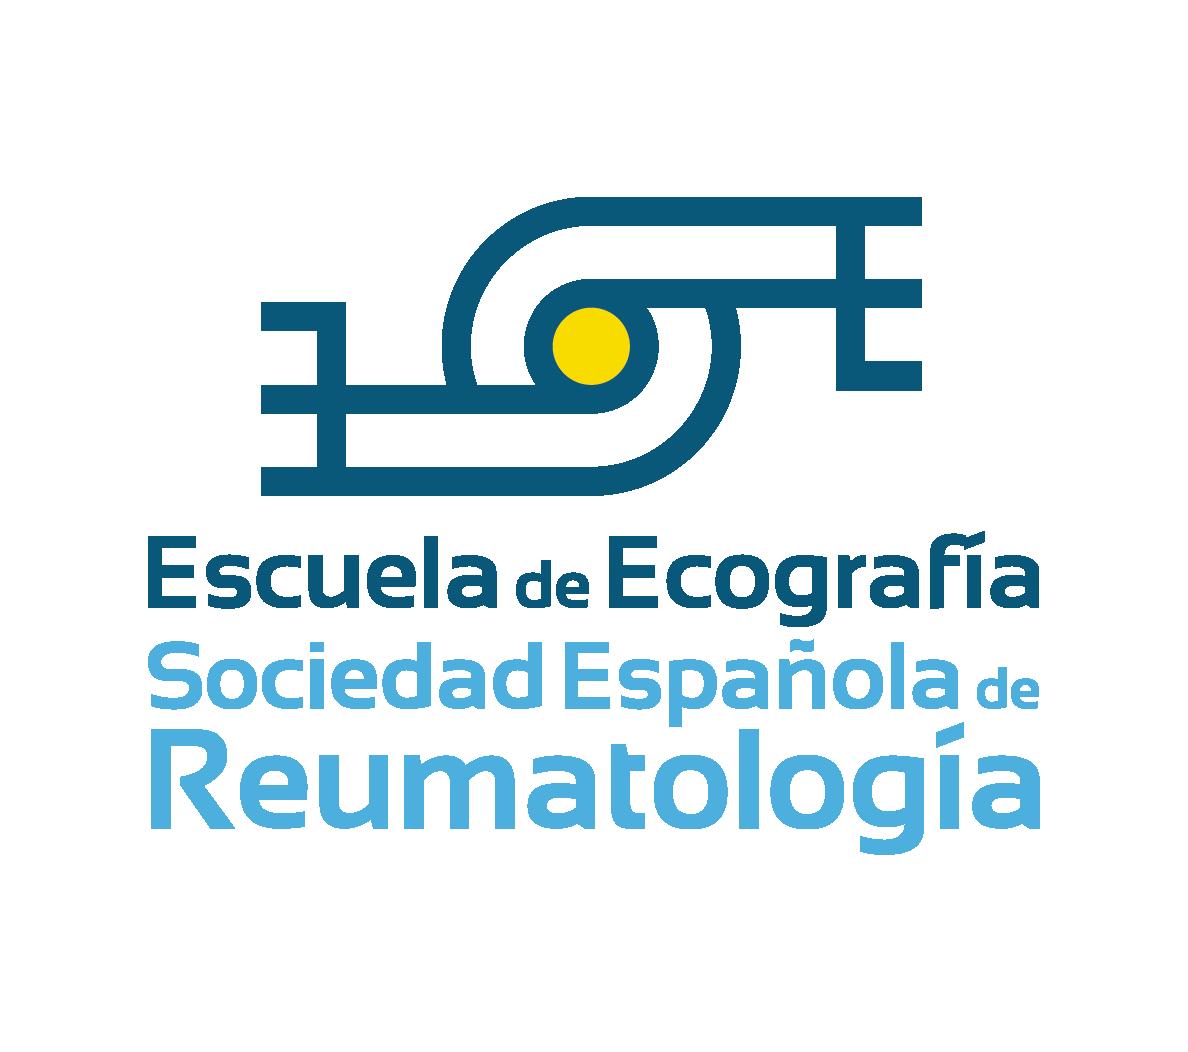 282014_escuela-eco-ser_vaaff_eco-vertical_eco-vertical